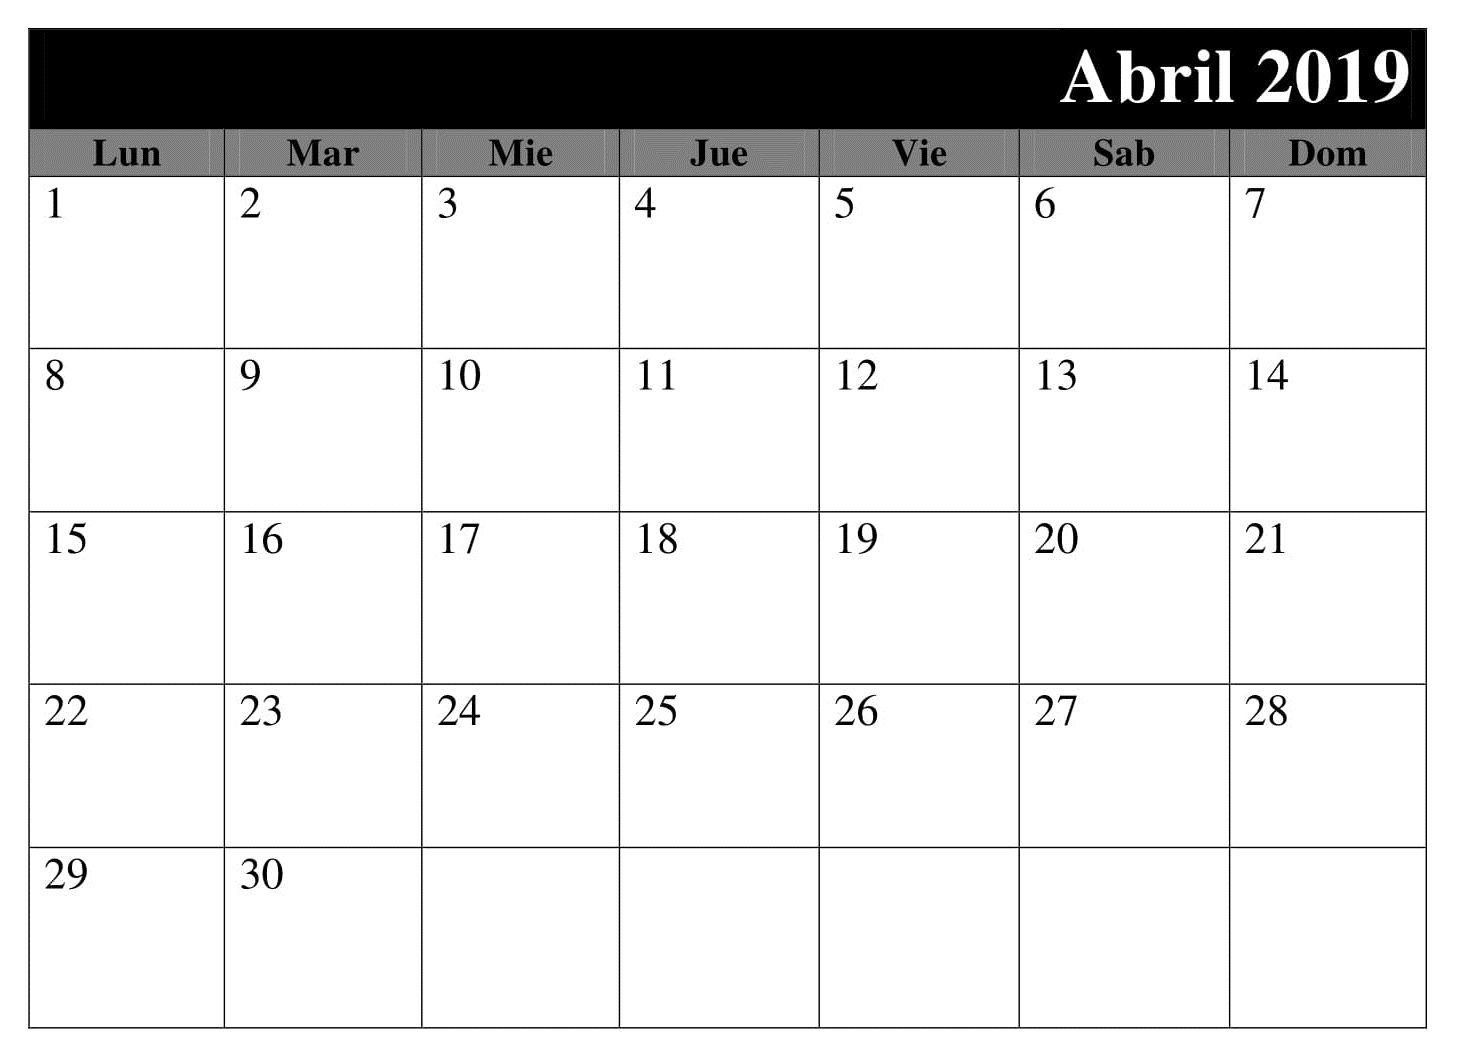 Calendario Imprimir Abril 2019.Calendario Grande 2019 Para Imprimir Abril Calendario Abril 2019